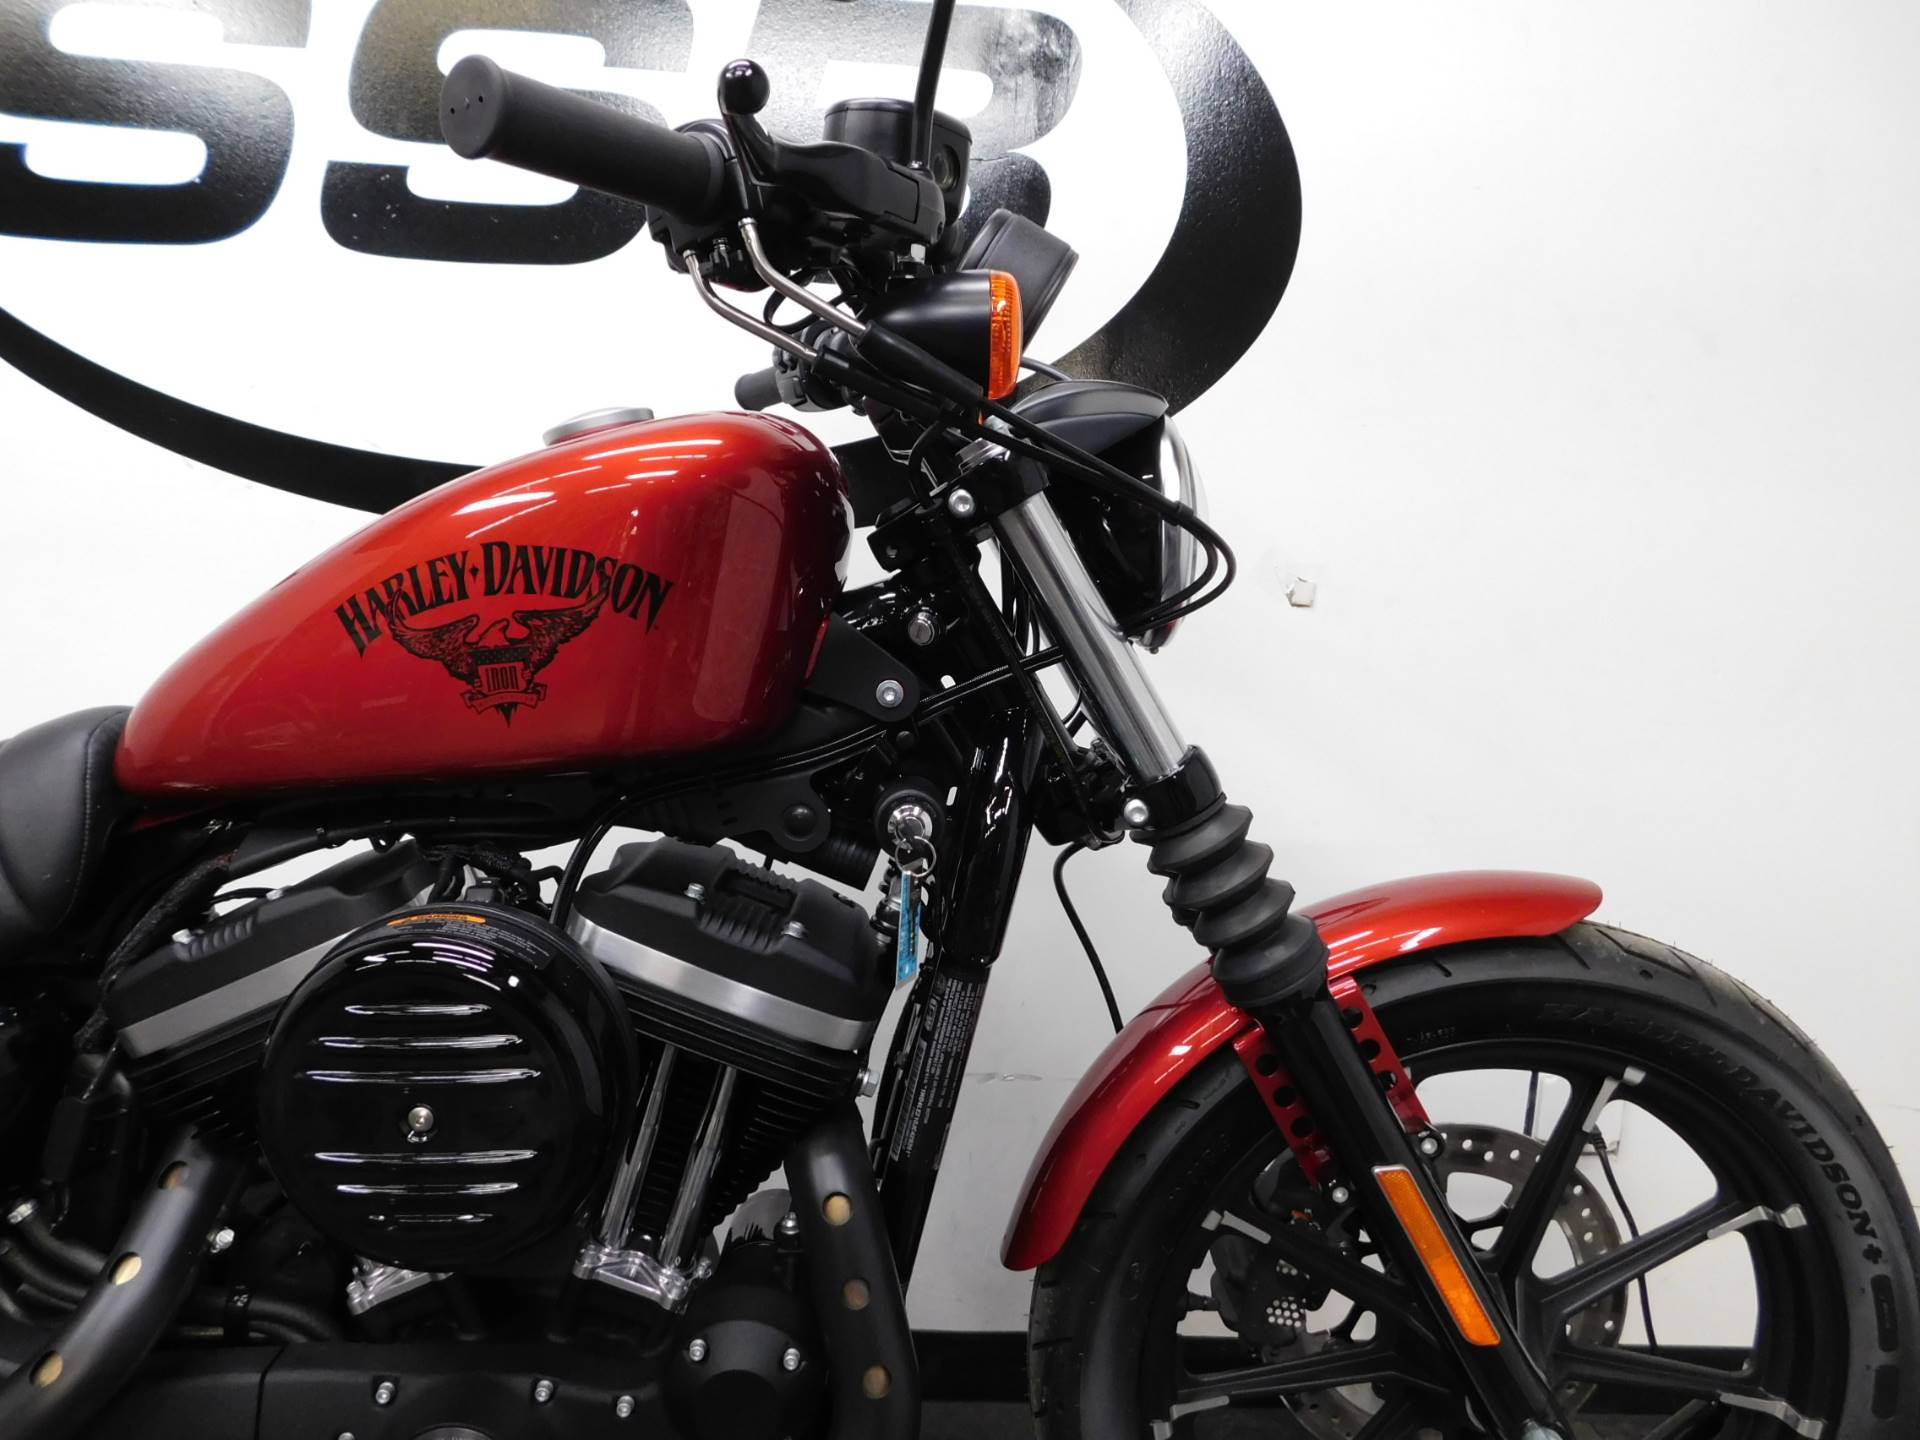 2018 Harley-Davidson Iron 883 12